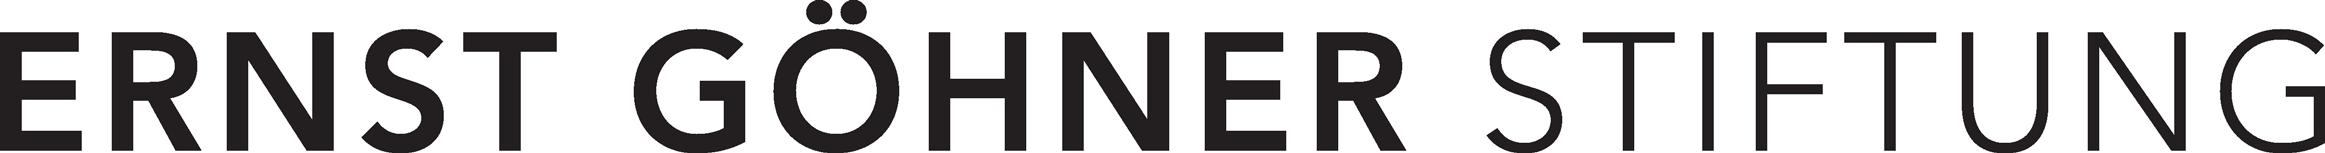 Sponsurs Ernst Göhner Stiftung